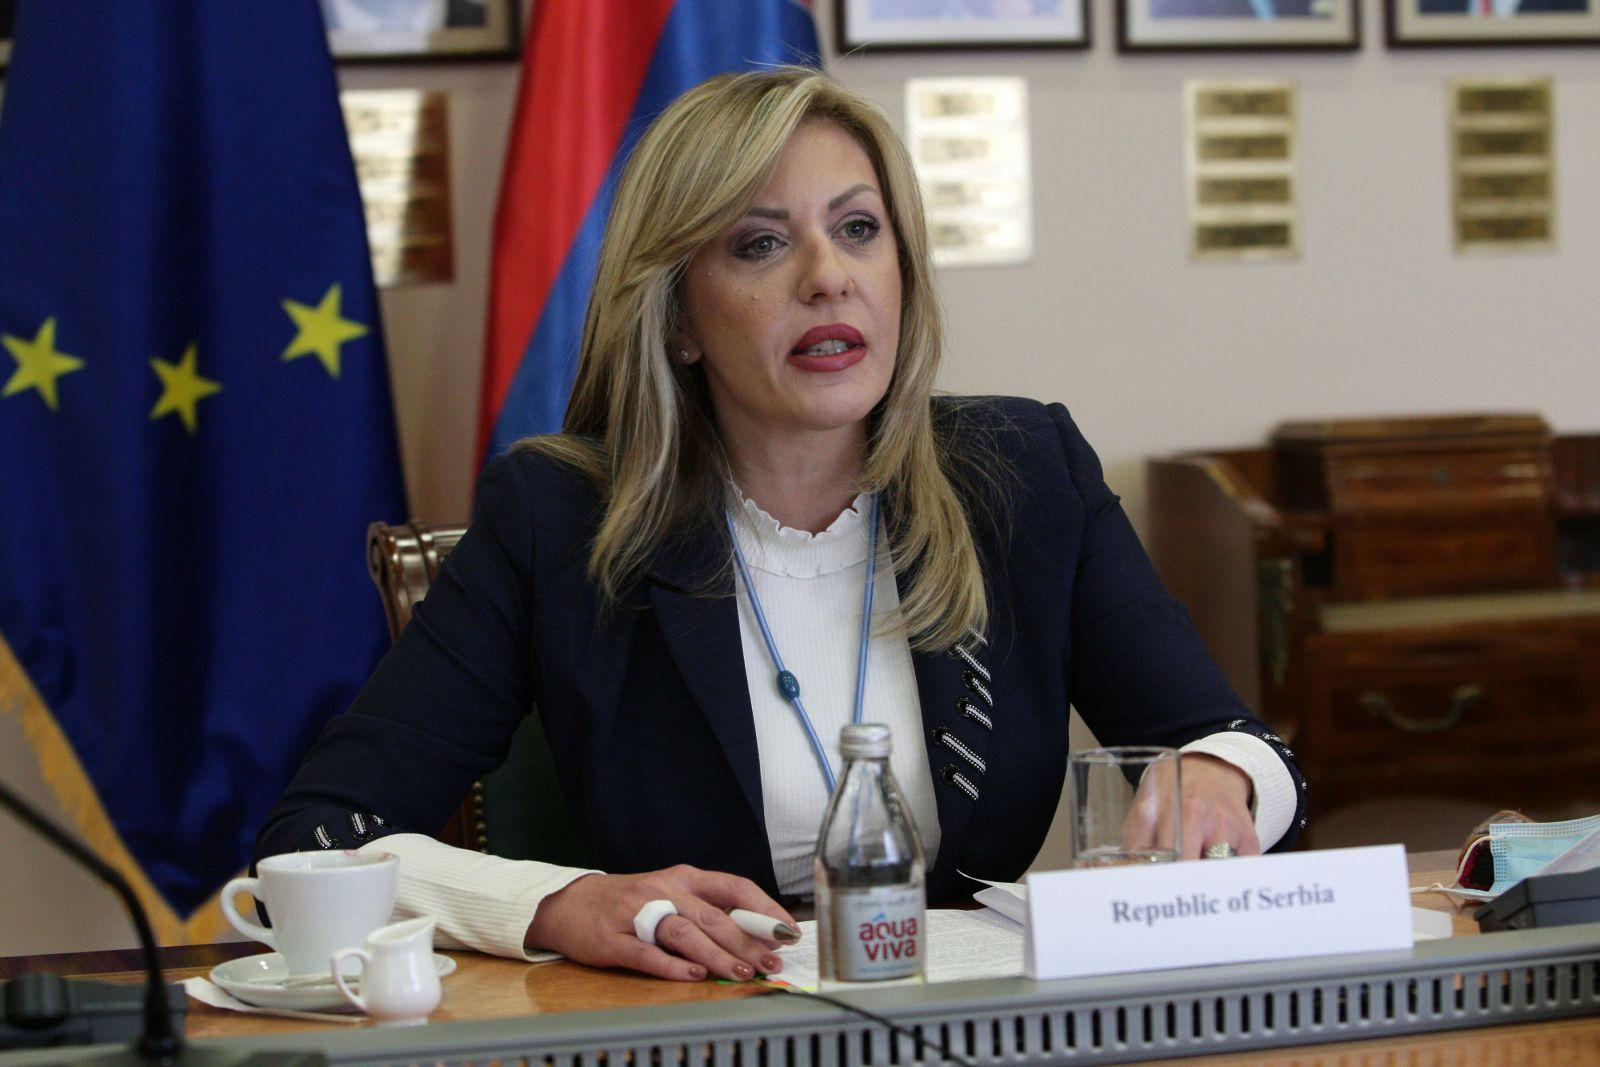 J. Joksimović: Iz budžetske podrške EU 18 miliona evra za posledice Kovid-19